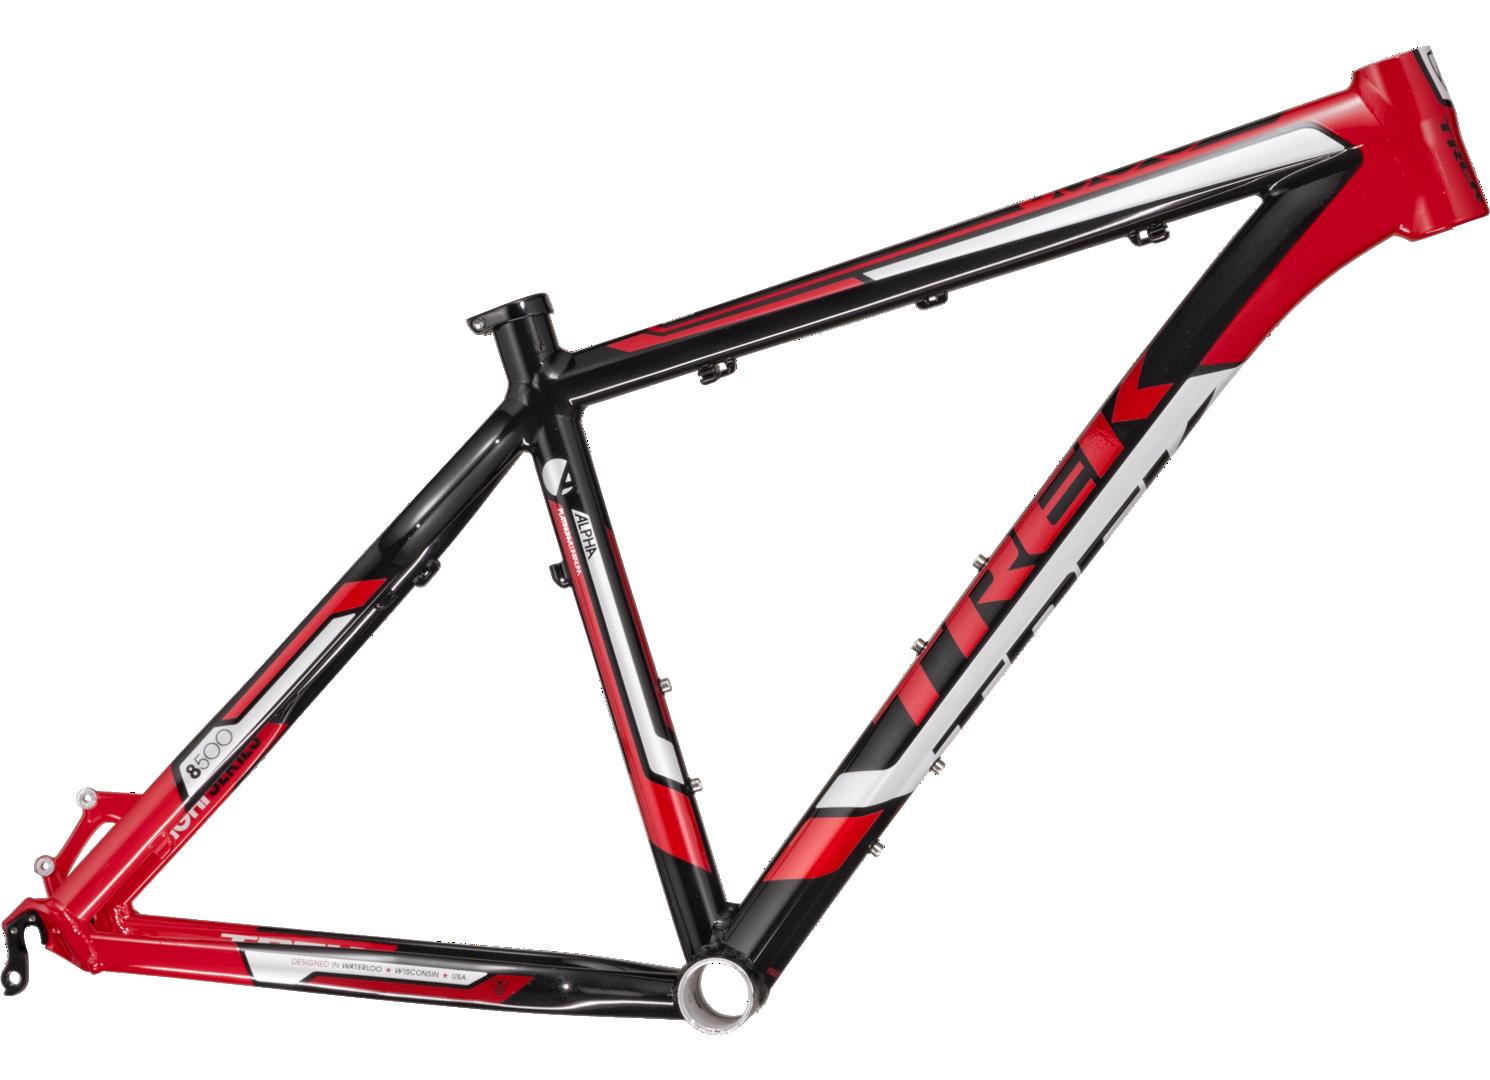 2012 8500 Frame - Bike Archive - Trek Bicycle